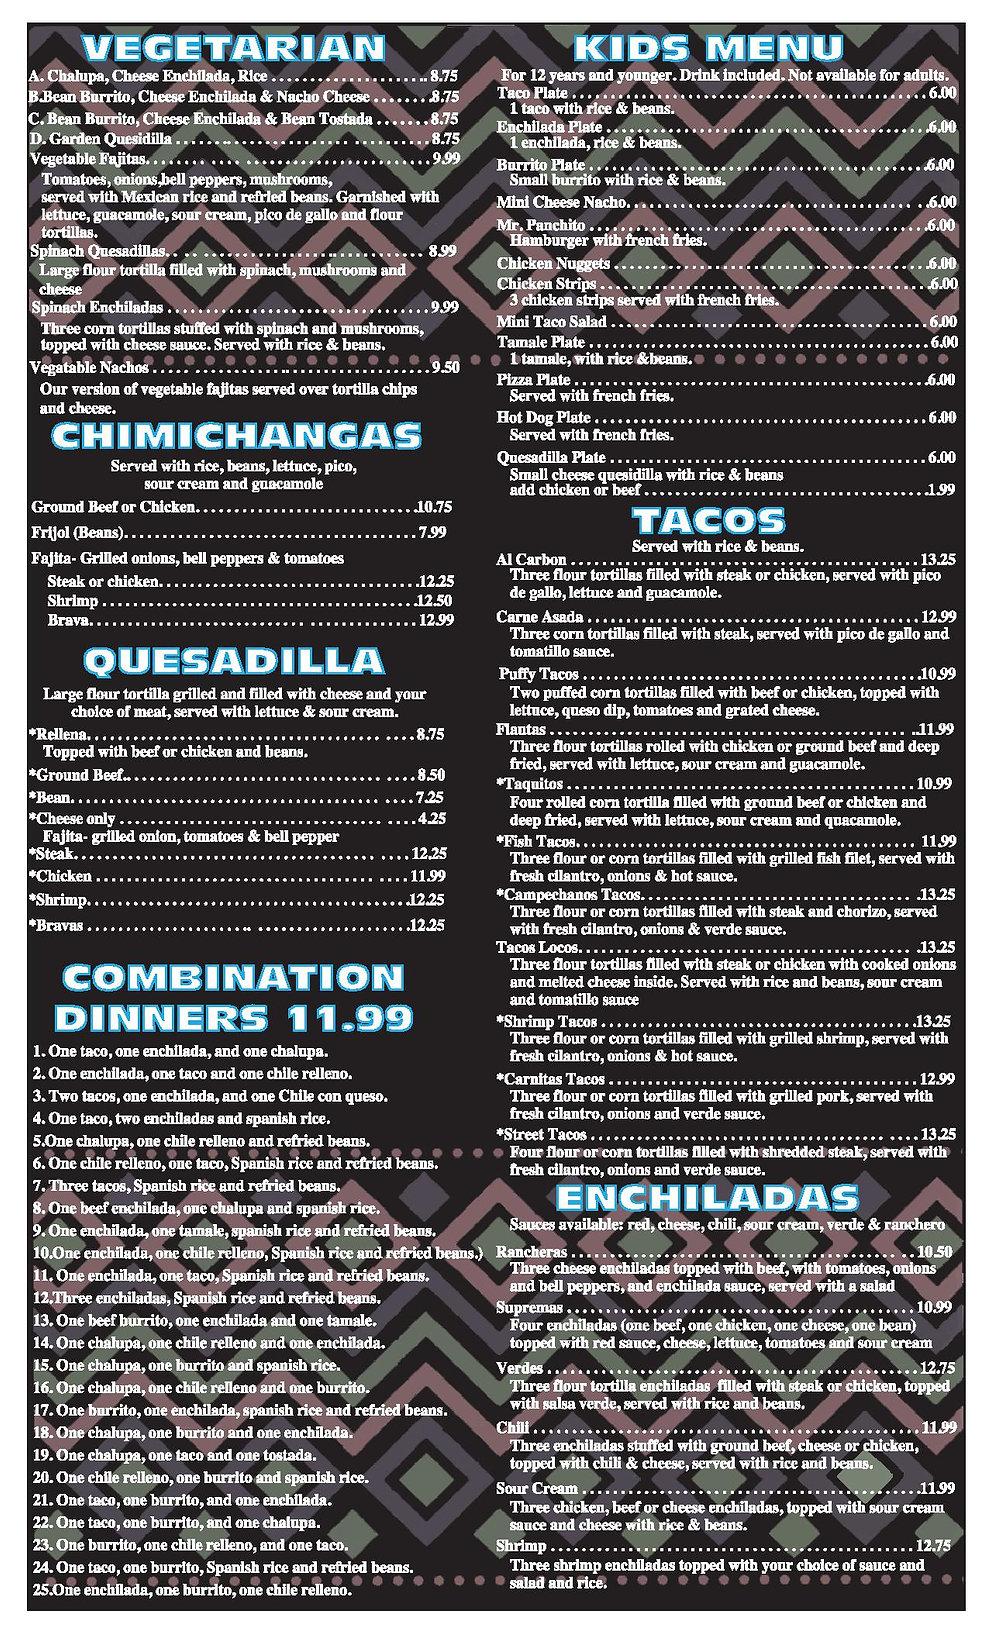 El Patio Shreveport menu pg 4 2020 OUTLI